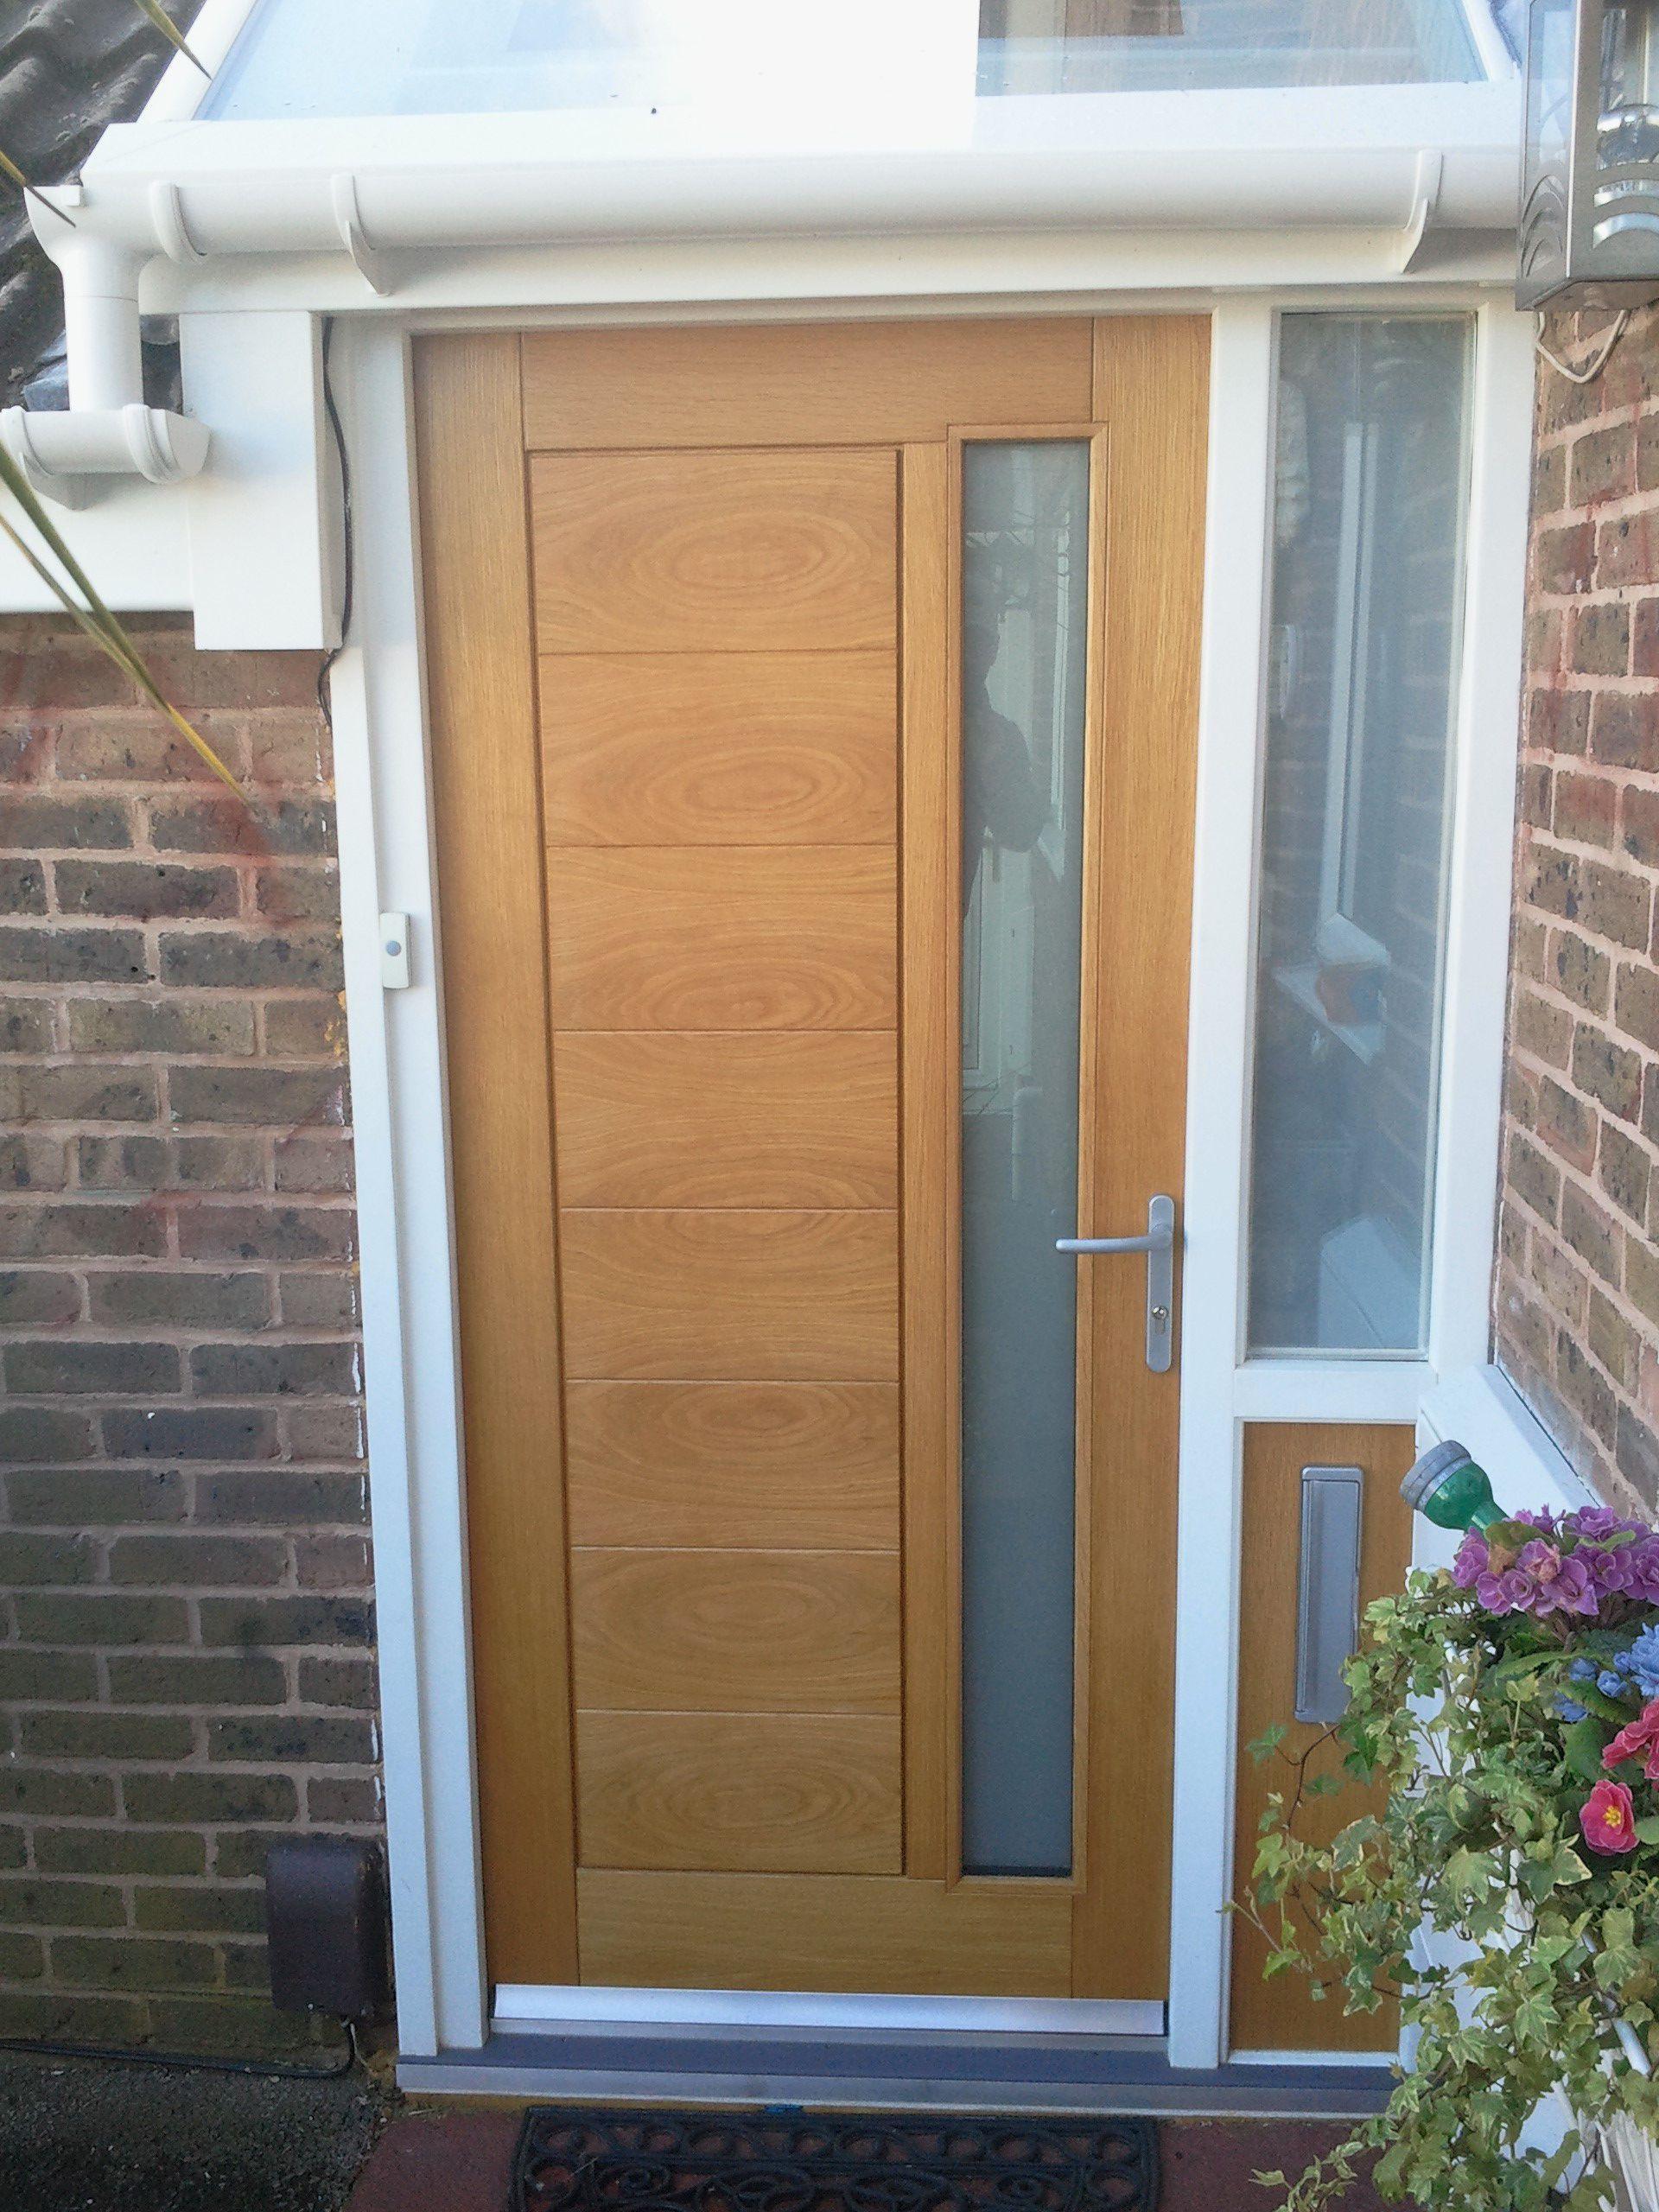 External modena door in oak makes a striking front door with a external modena door in oak makes a striking front door with a double glazed glass planetlyrics Image collections